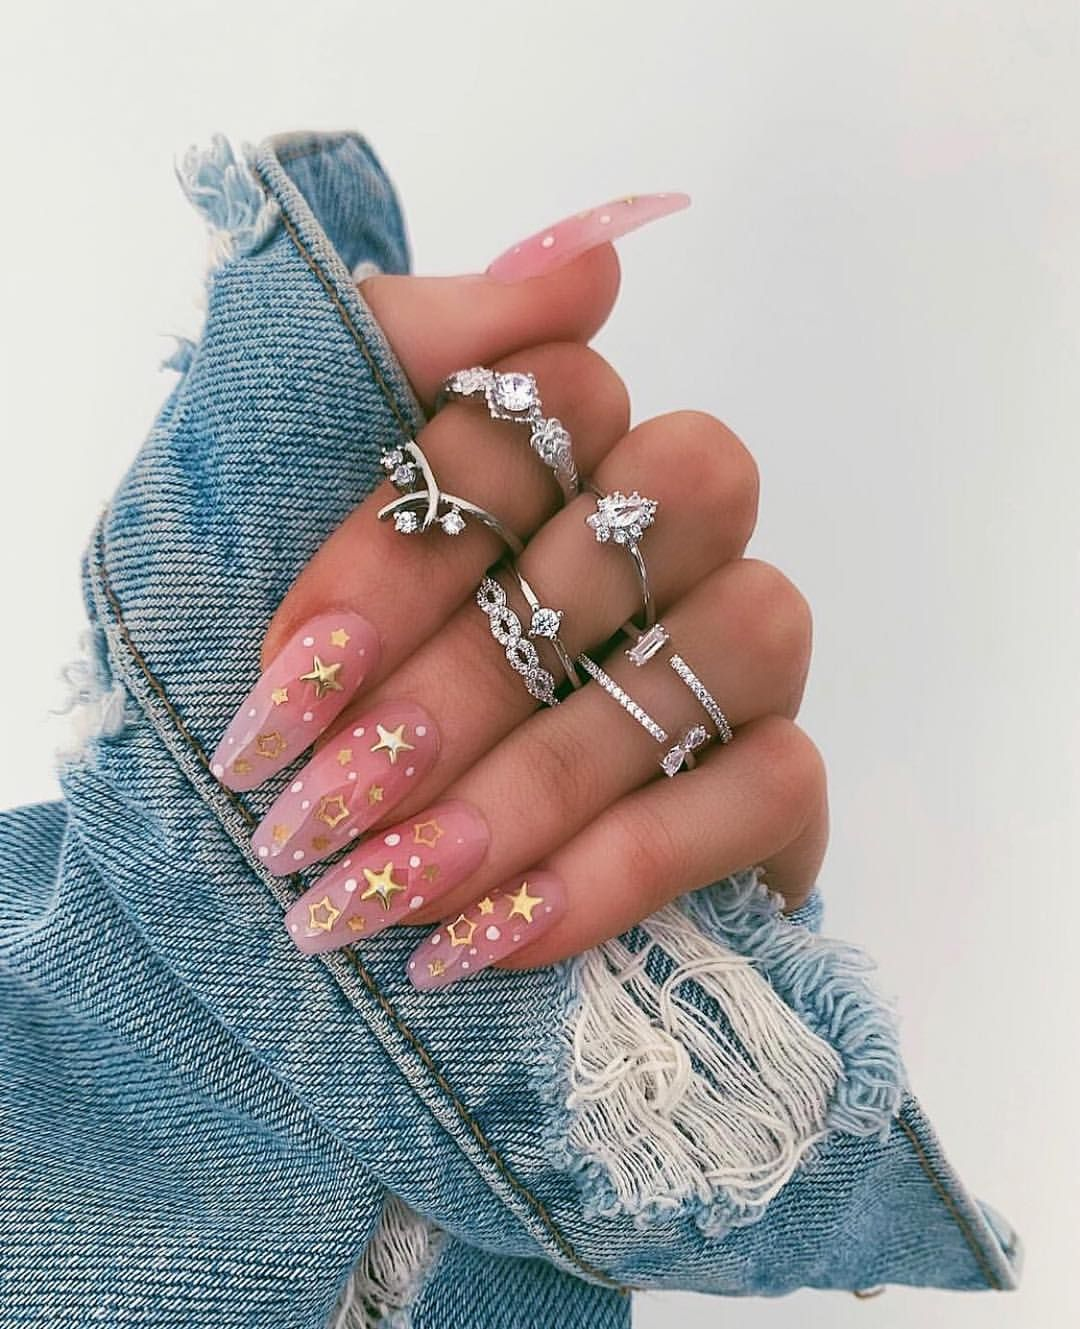 Boohoo Com On Instagram Nailed It Bohomoon Doyourthing Nails Inspiration Best Acrylic Nails Pretty Acrylic Nails